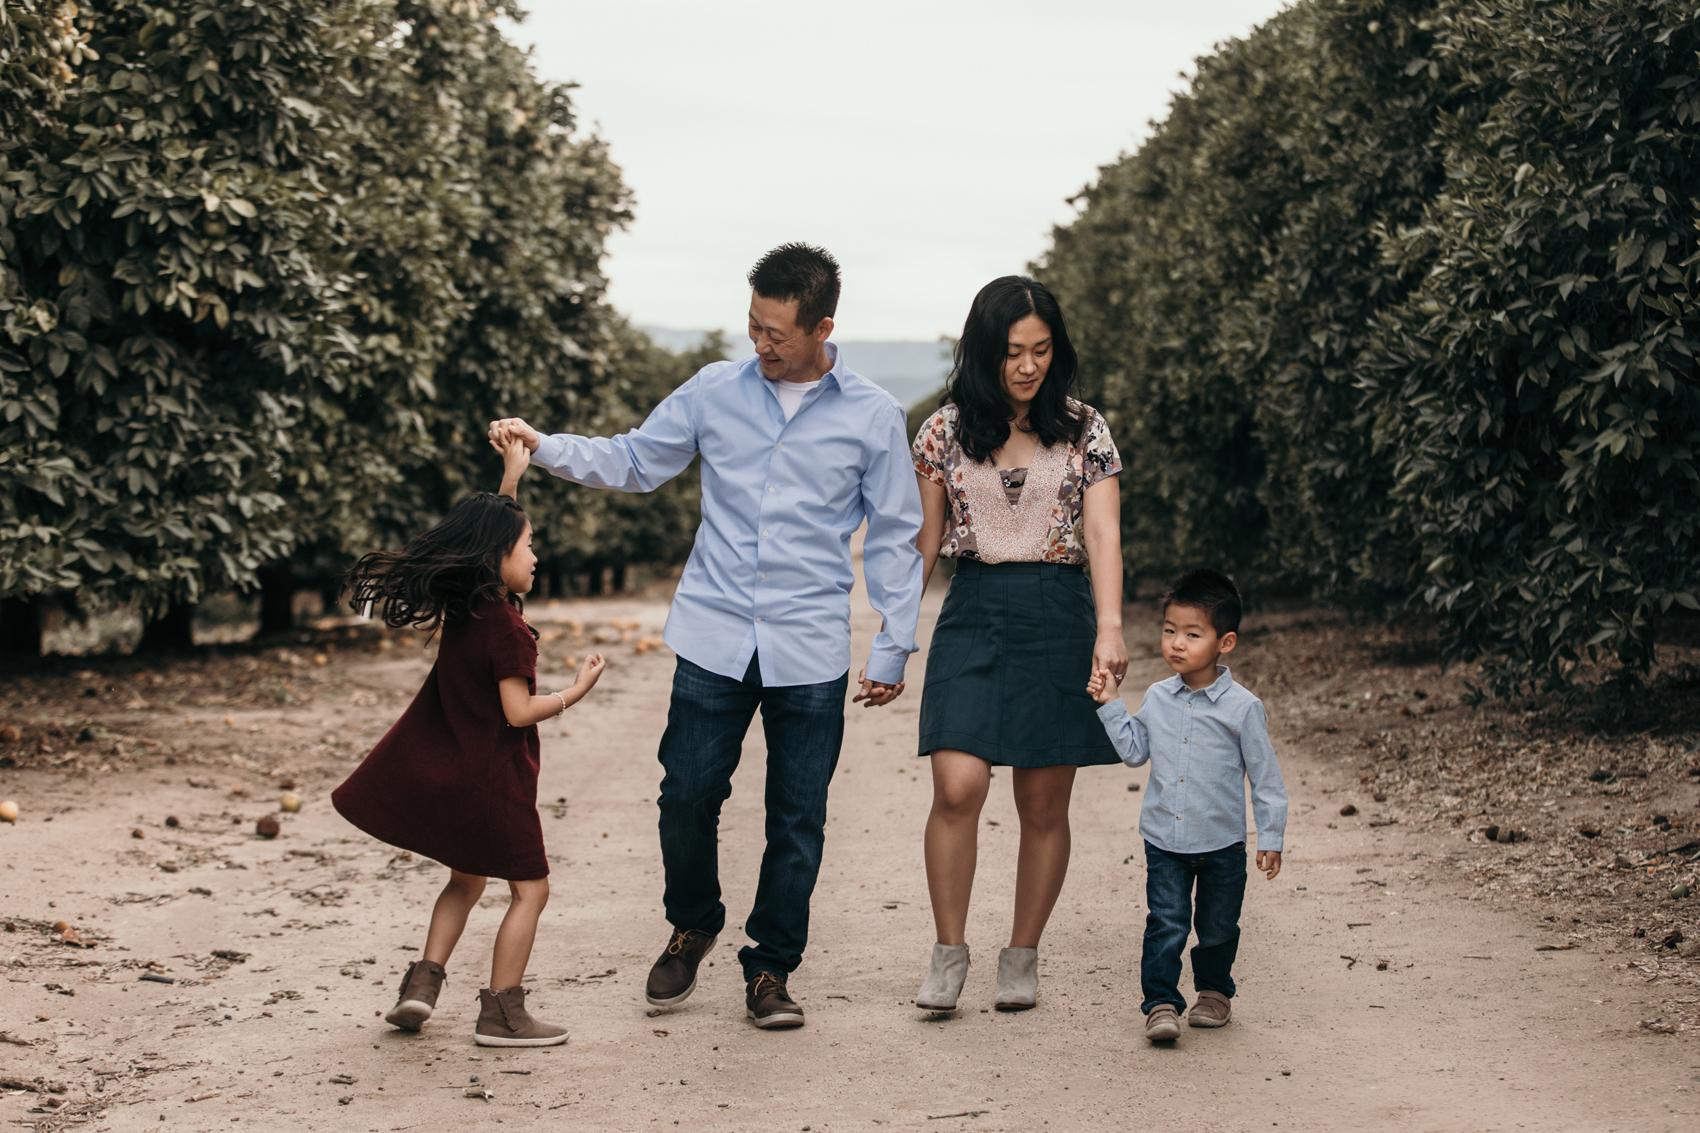 Sandiegofamilyphotographer.jpg